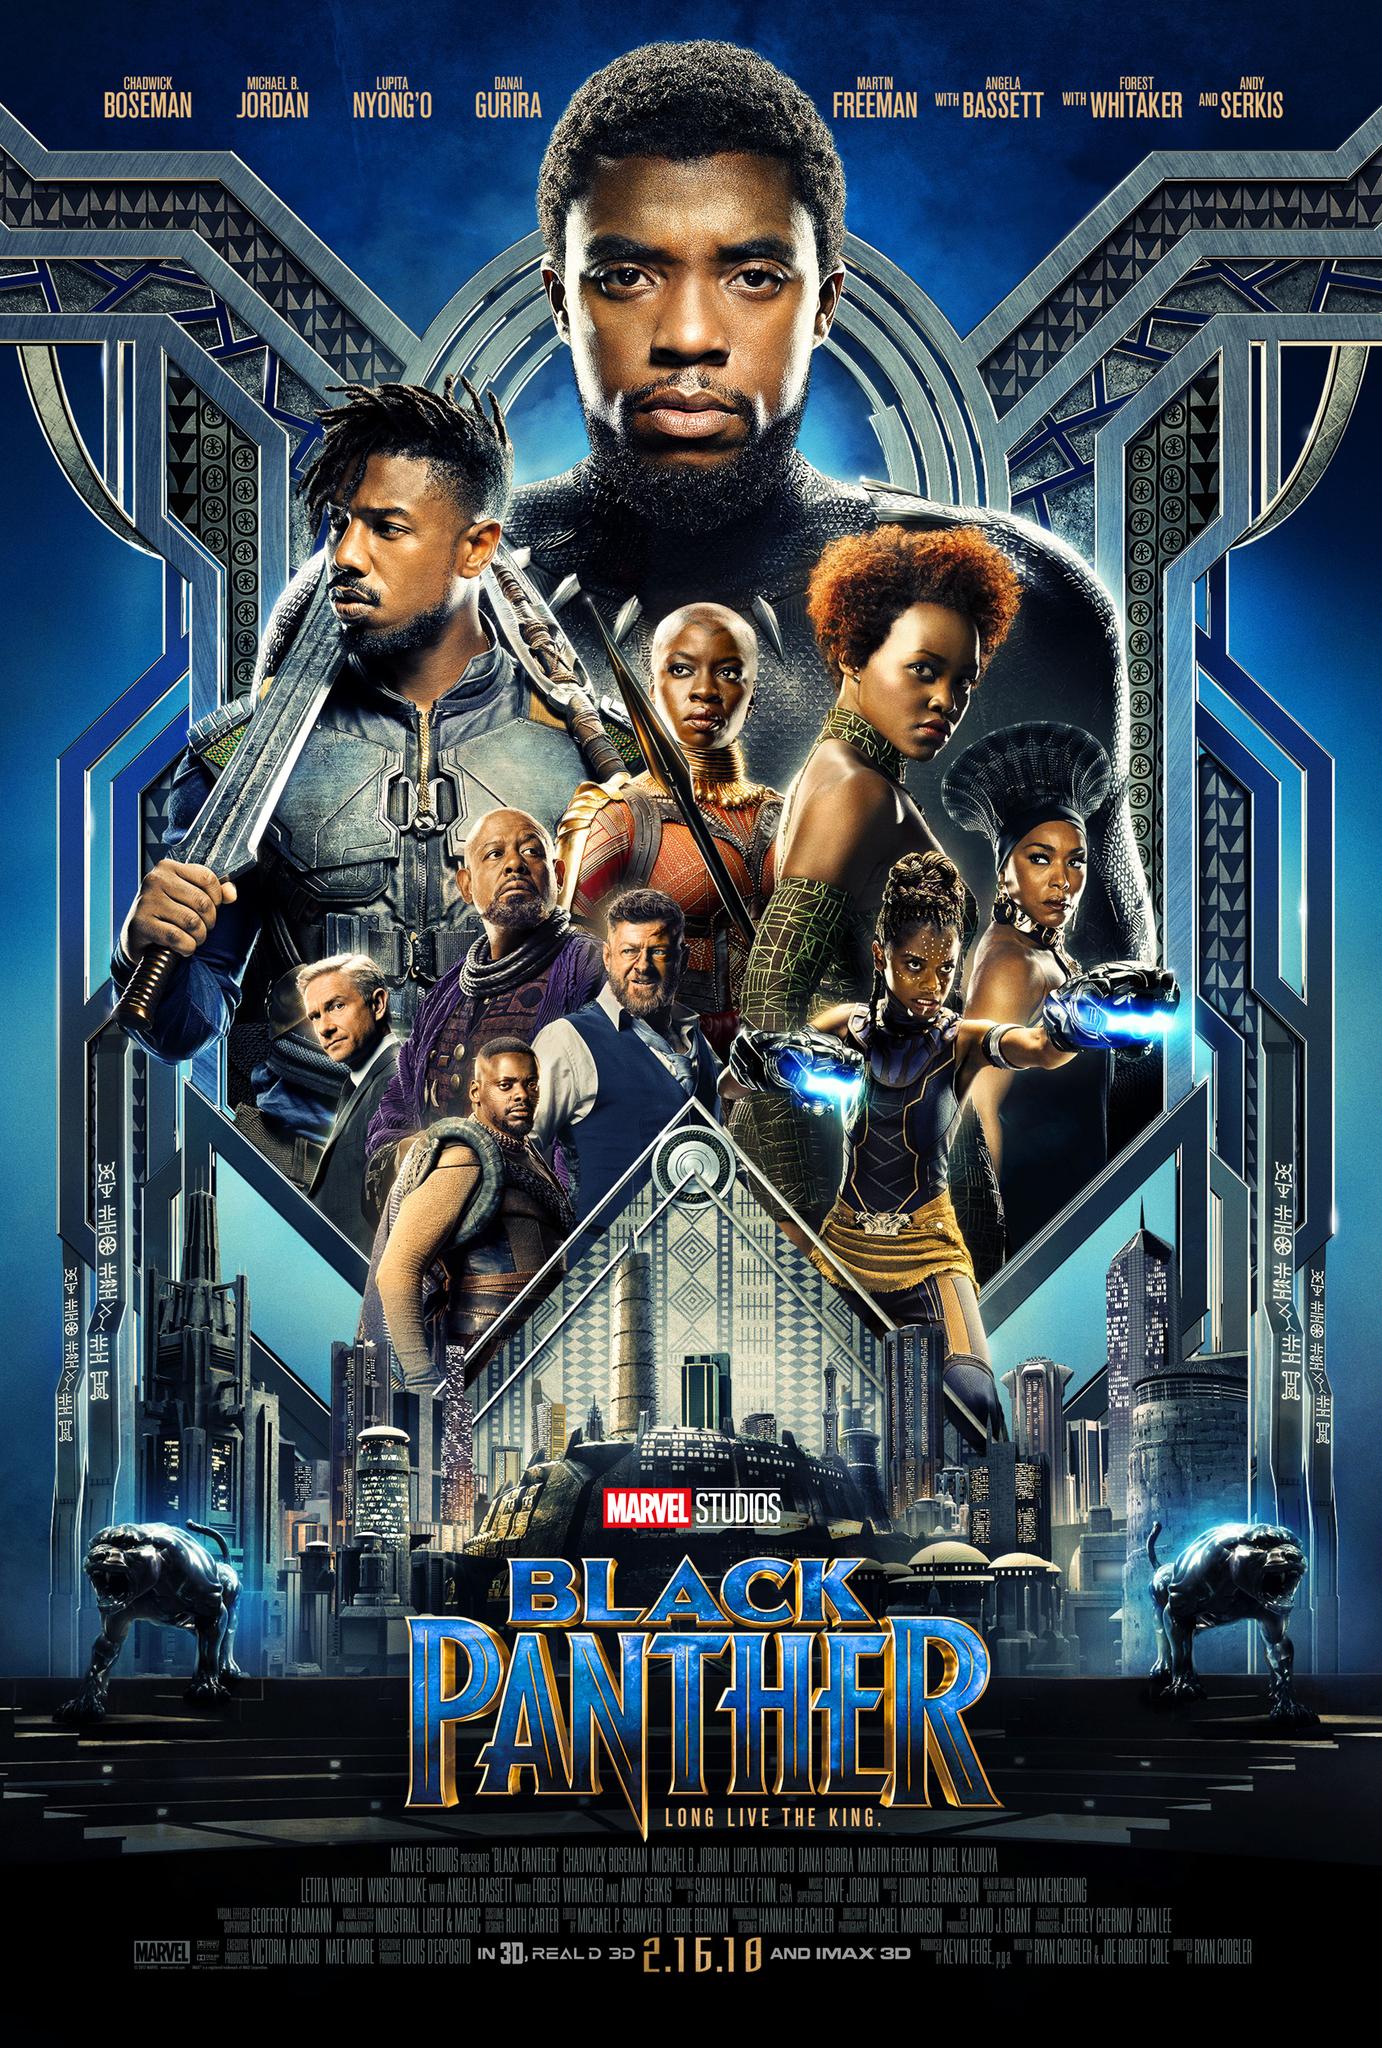 'Black Panther' To Be Honoured at Common Sense Awards